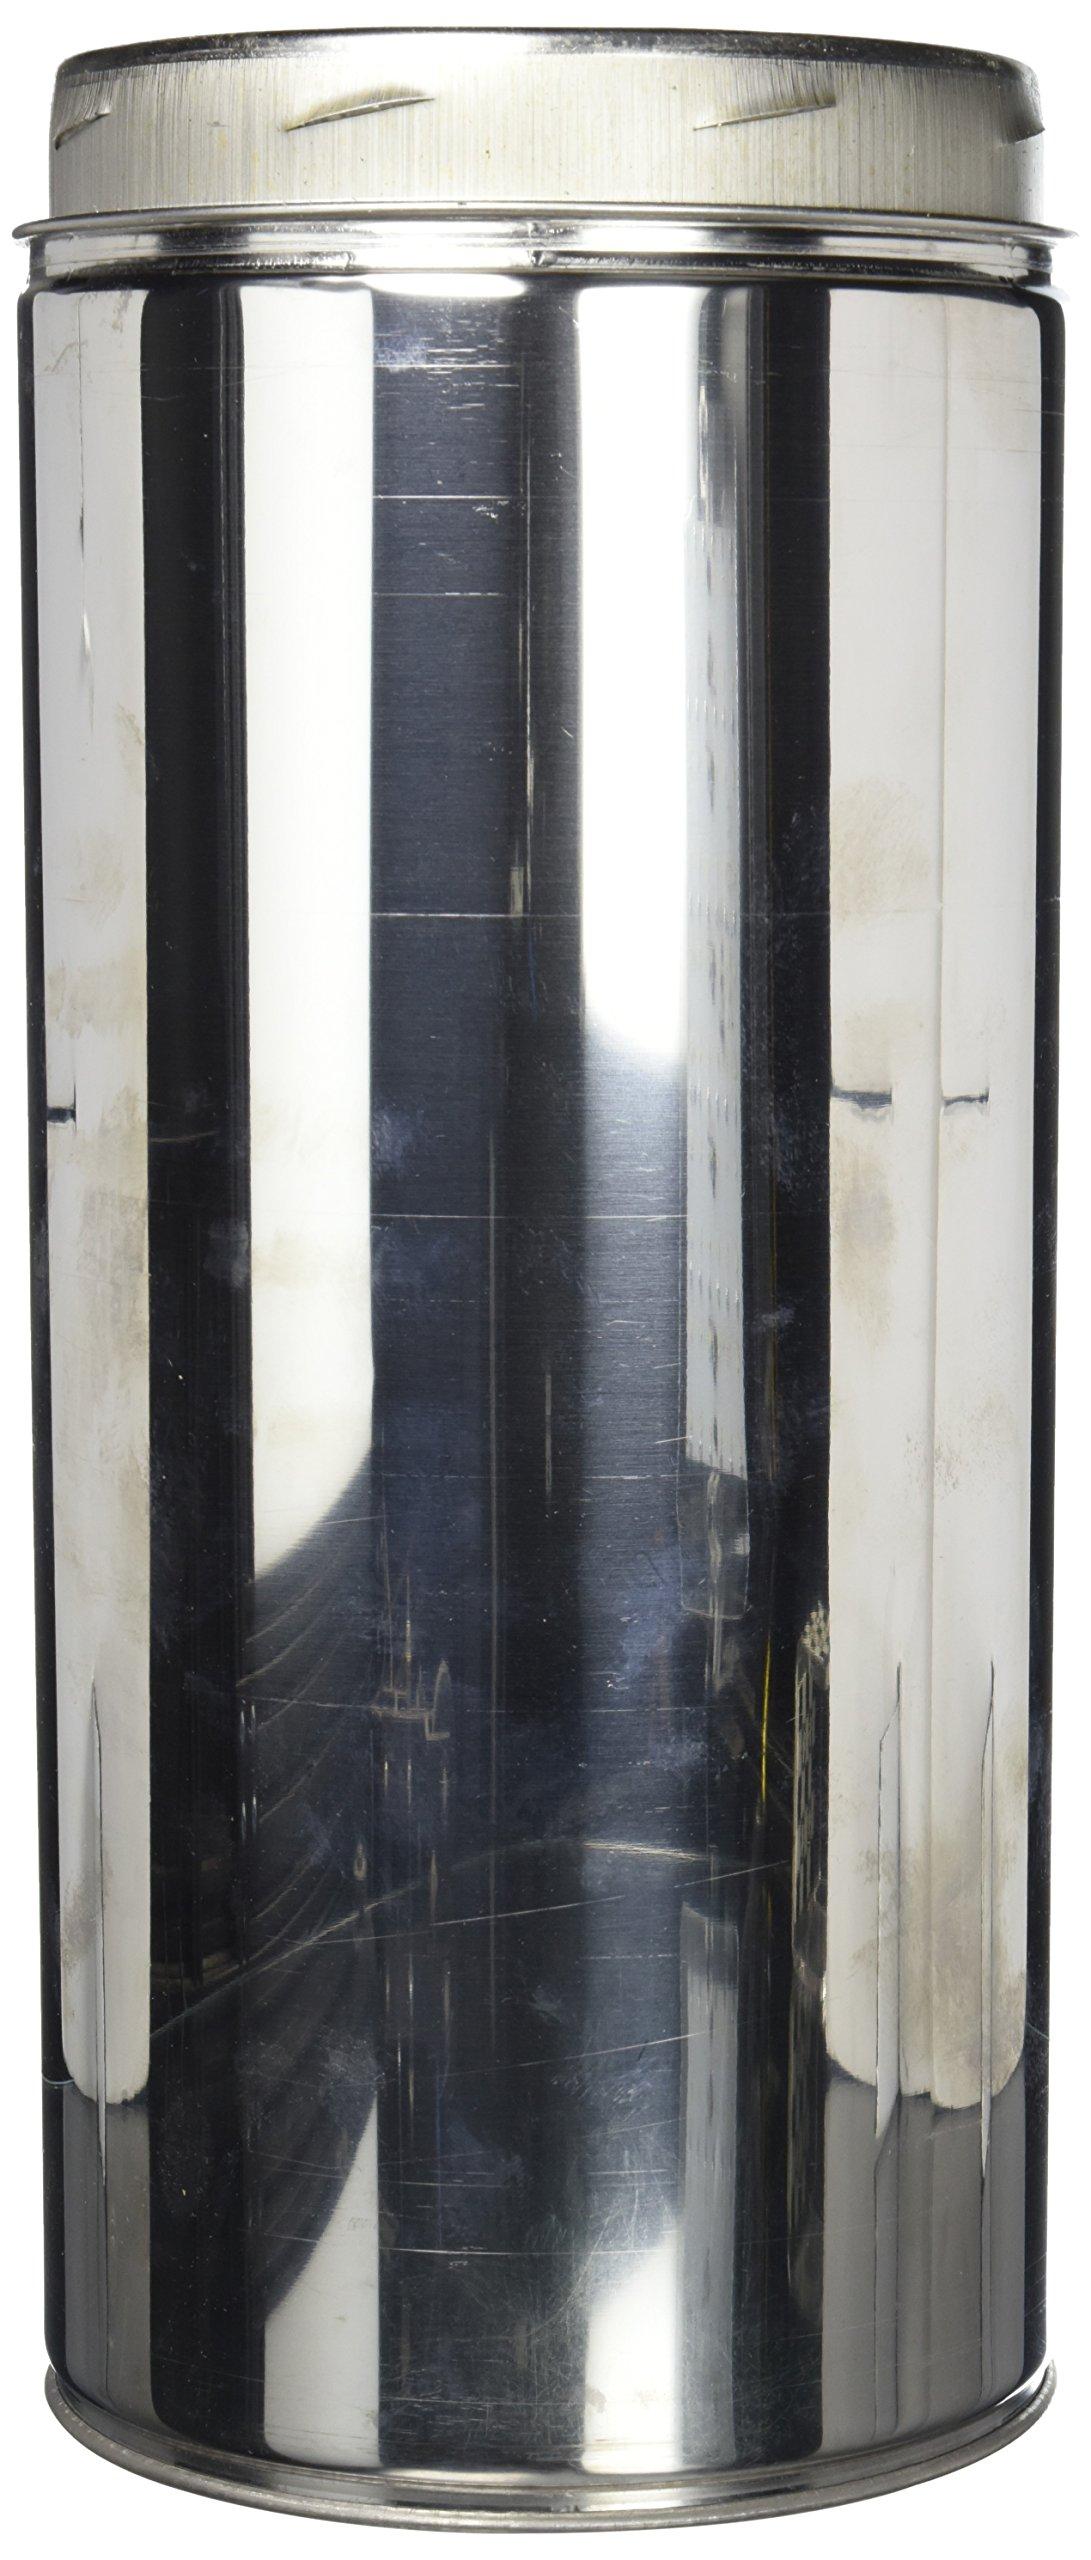 Selkirk Metalbestos 6UT-18 6-Inch X 18-Inch Stainless Steel Insulated Chimney Pipe